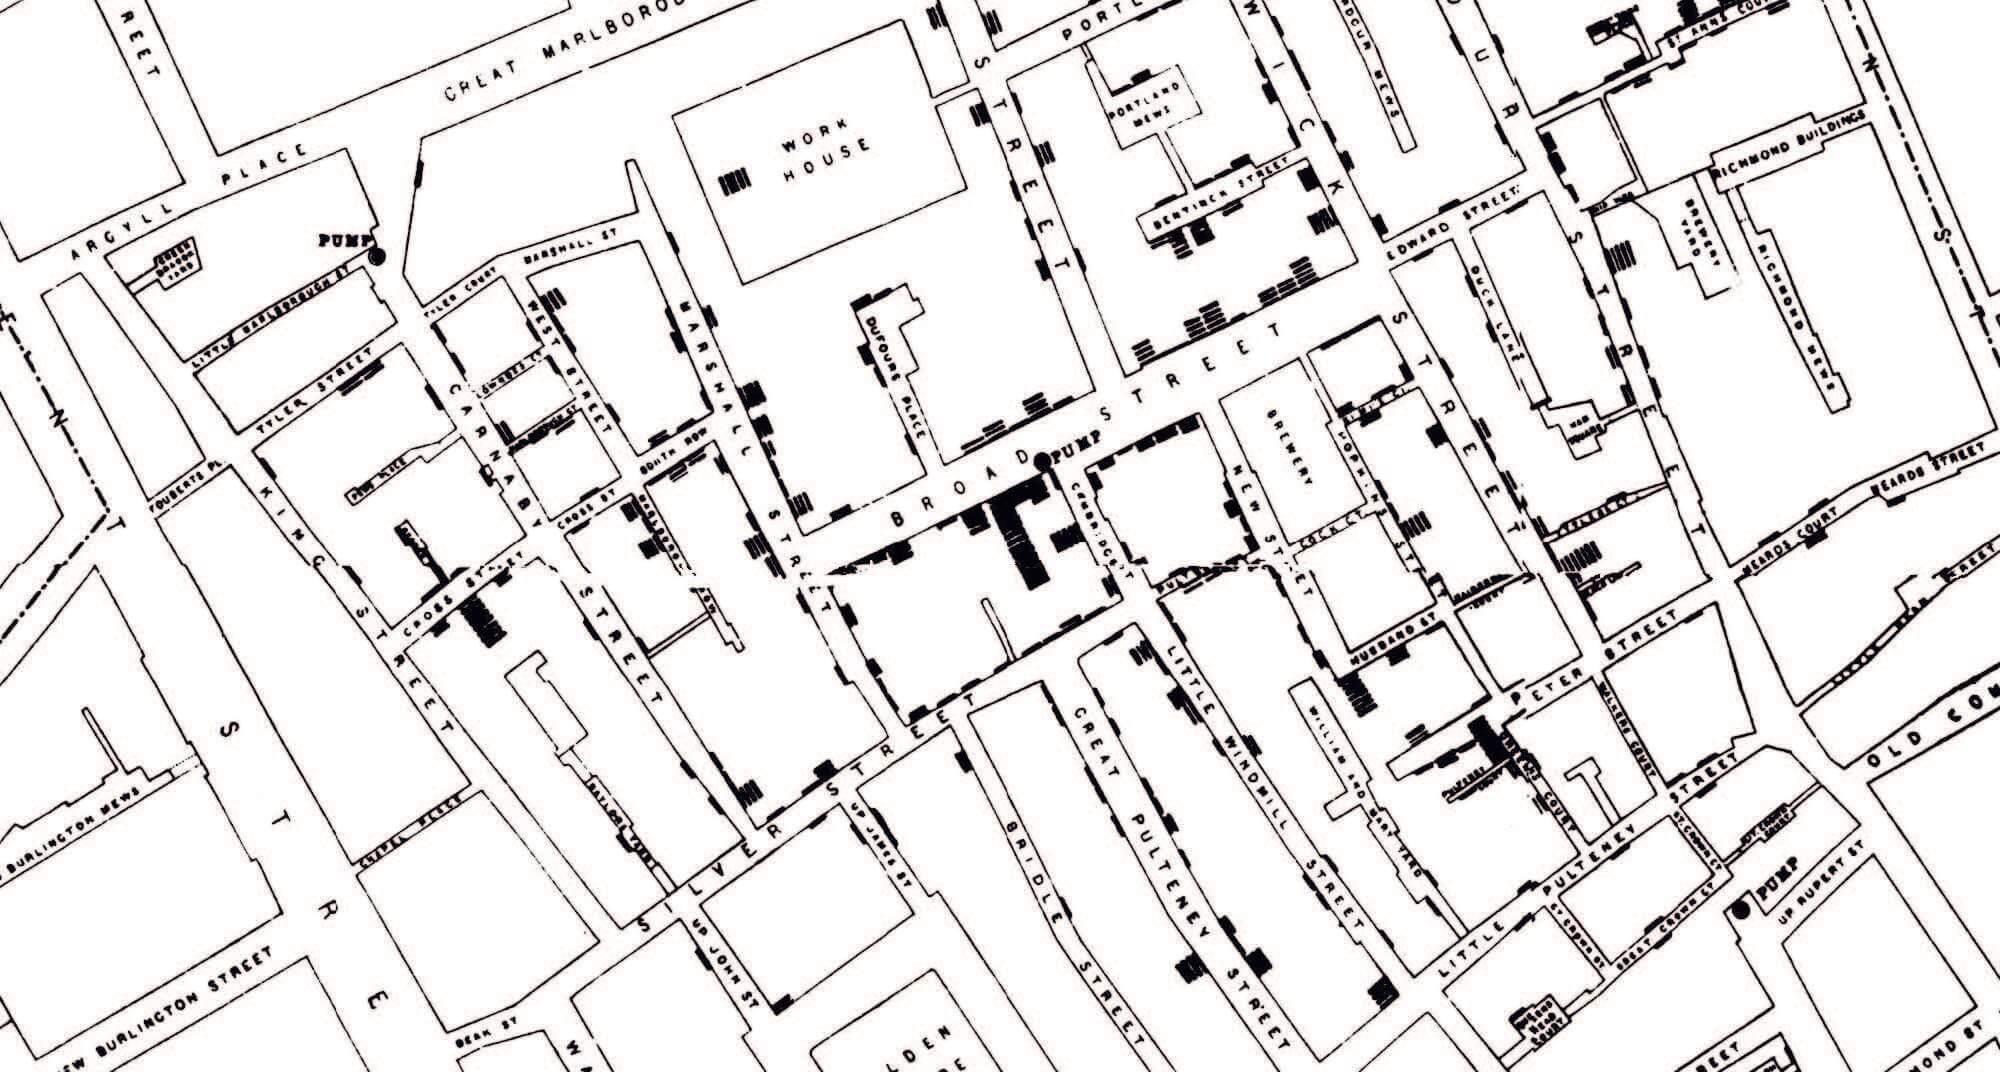 John Snow's cholera map - a revolution for data visualization on maps